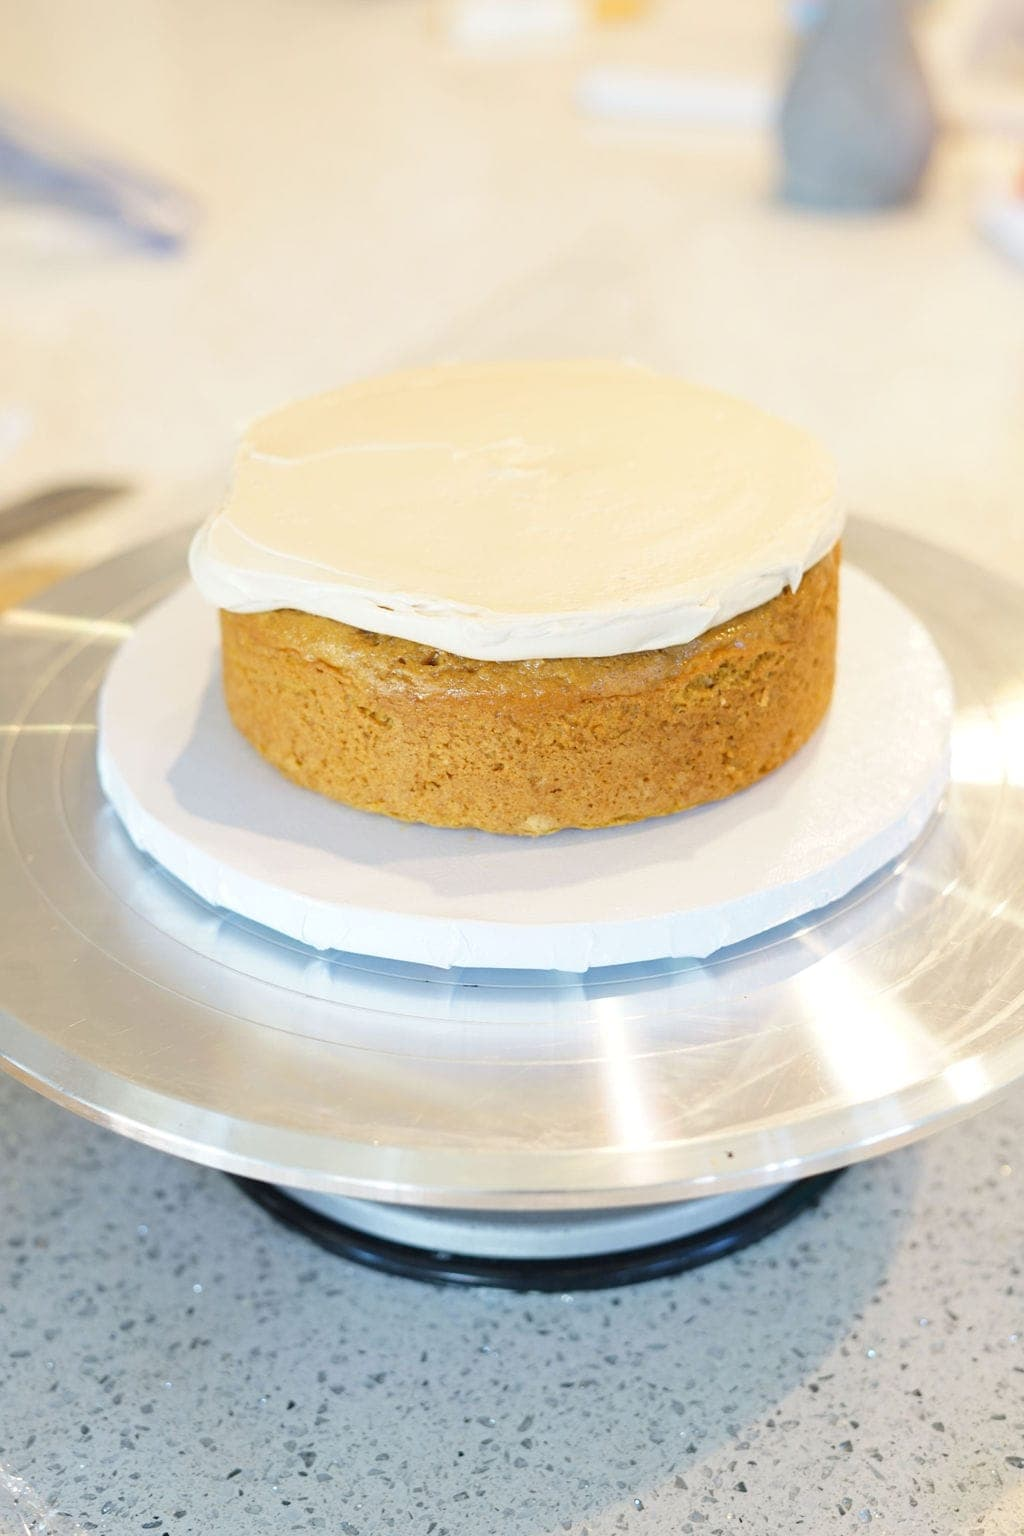 buttercream frosting on cake